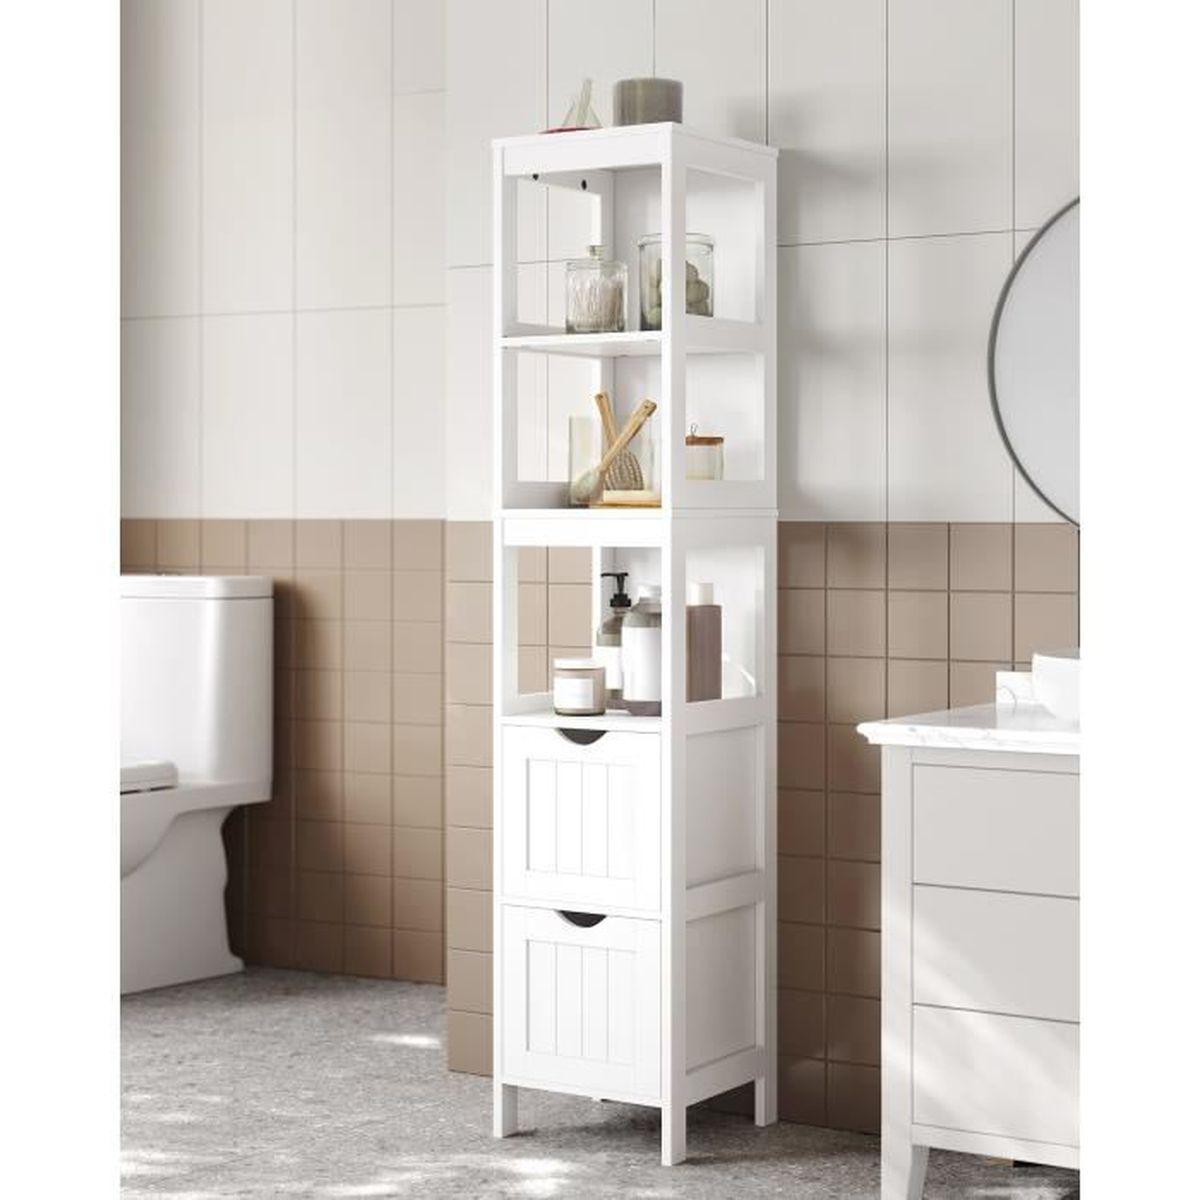 Armoire Haute De Salle De Bain vasagle salle de bain,armoire haute,placard de rangement